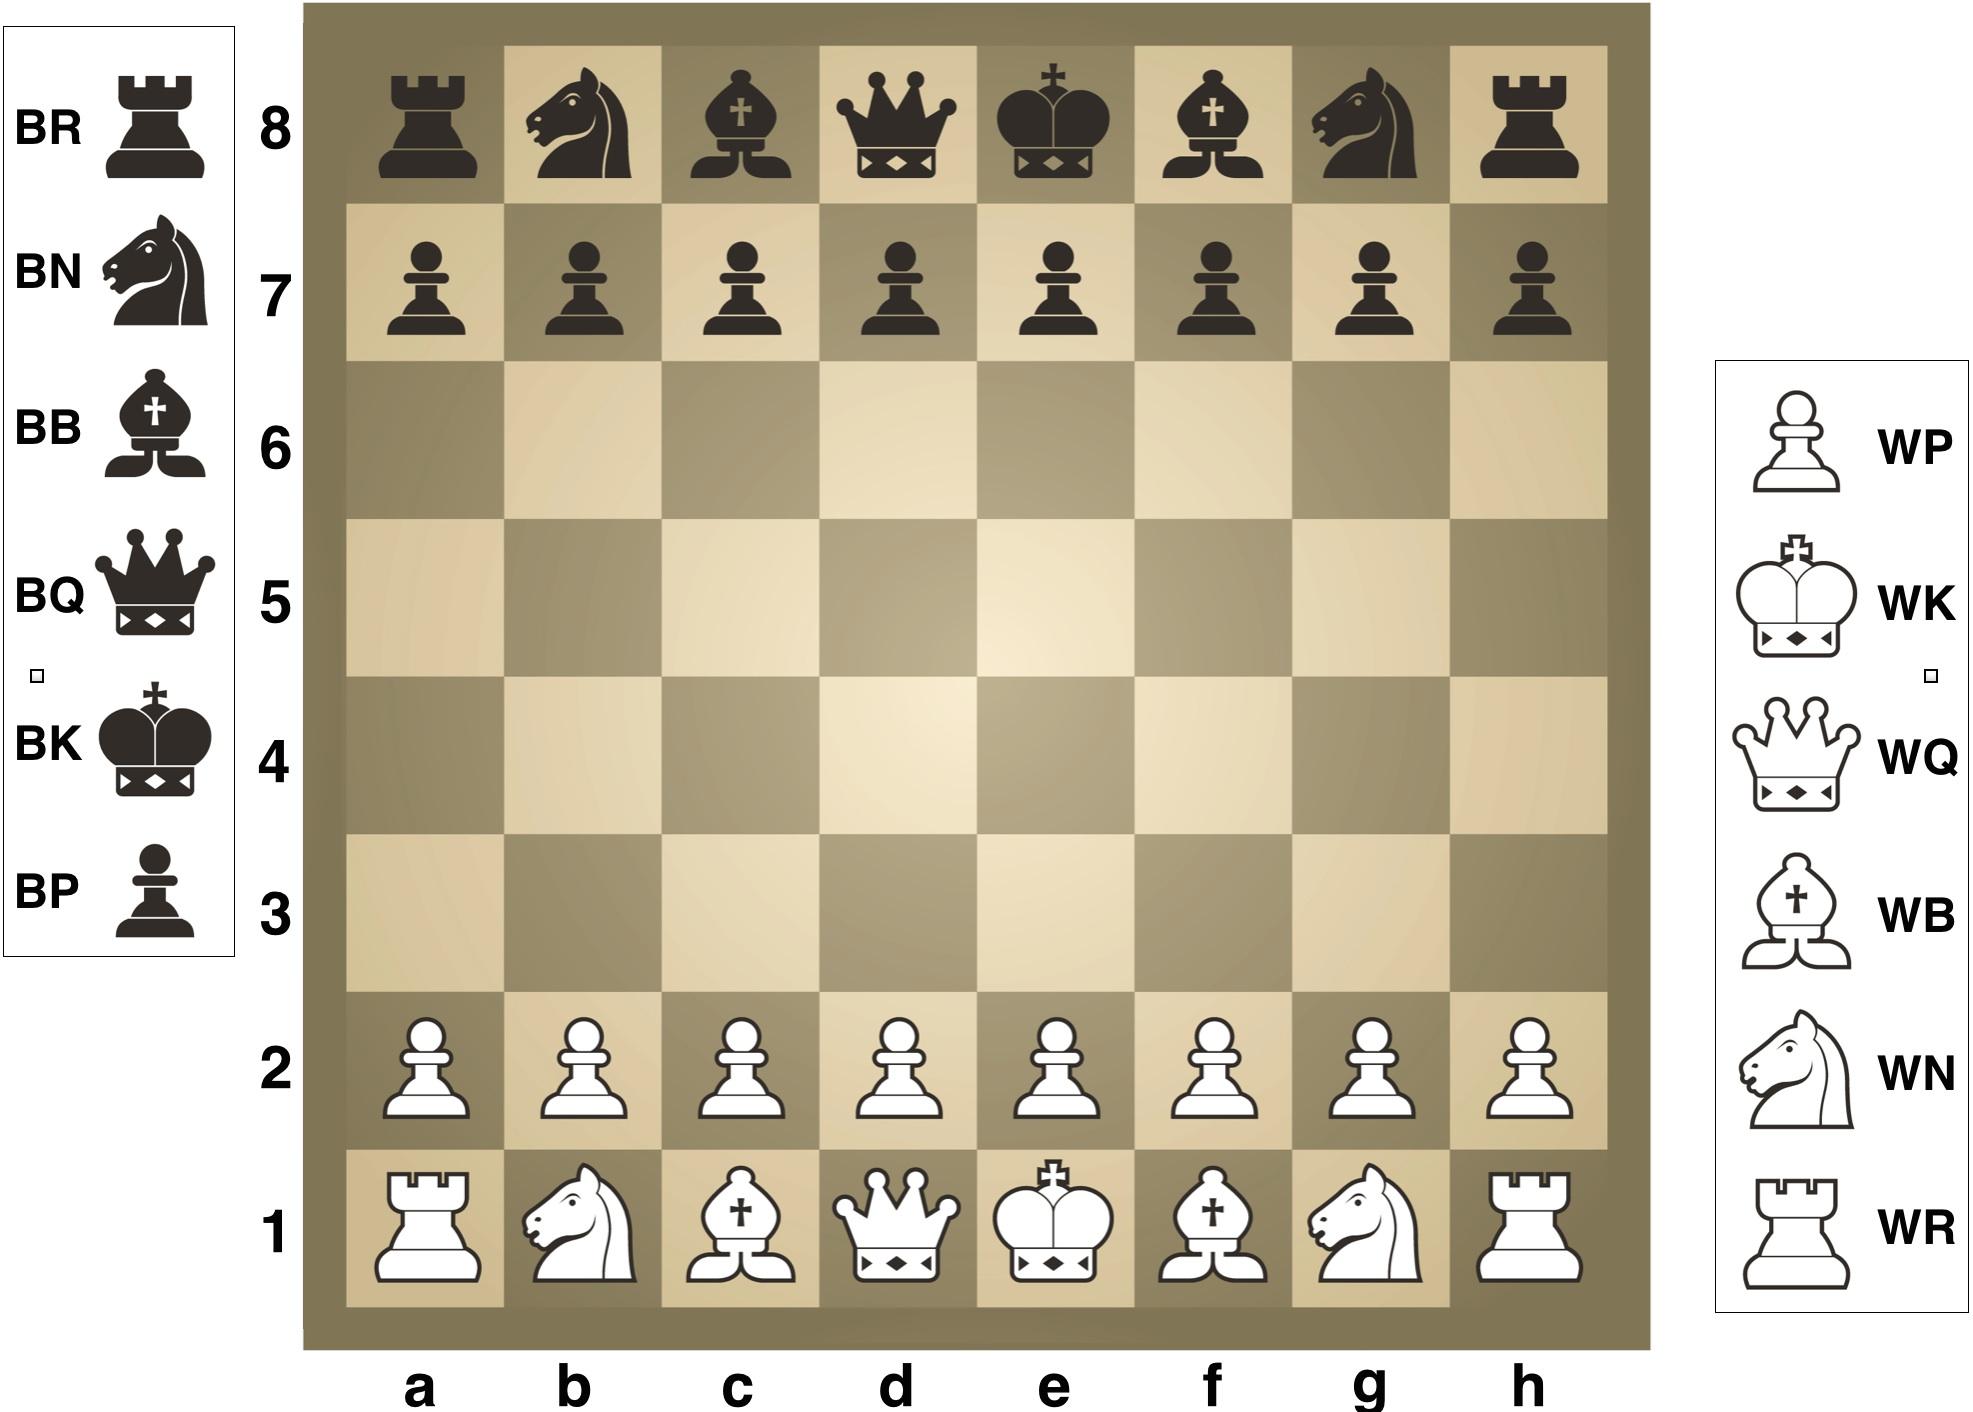 A chessboard with algebraic notation